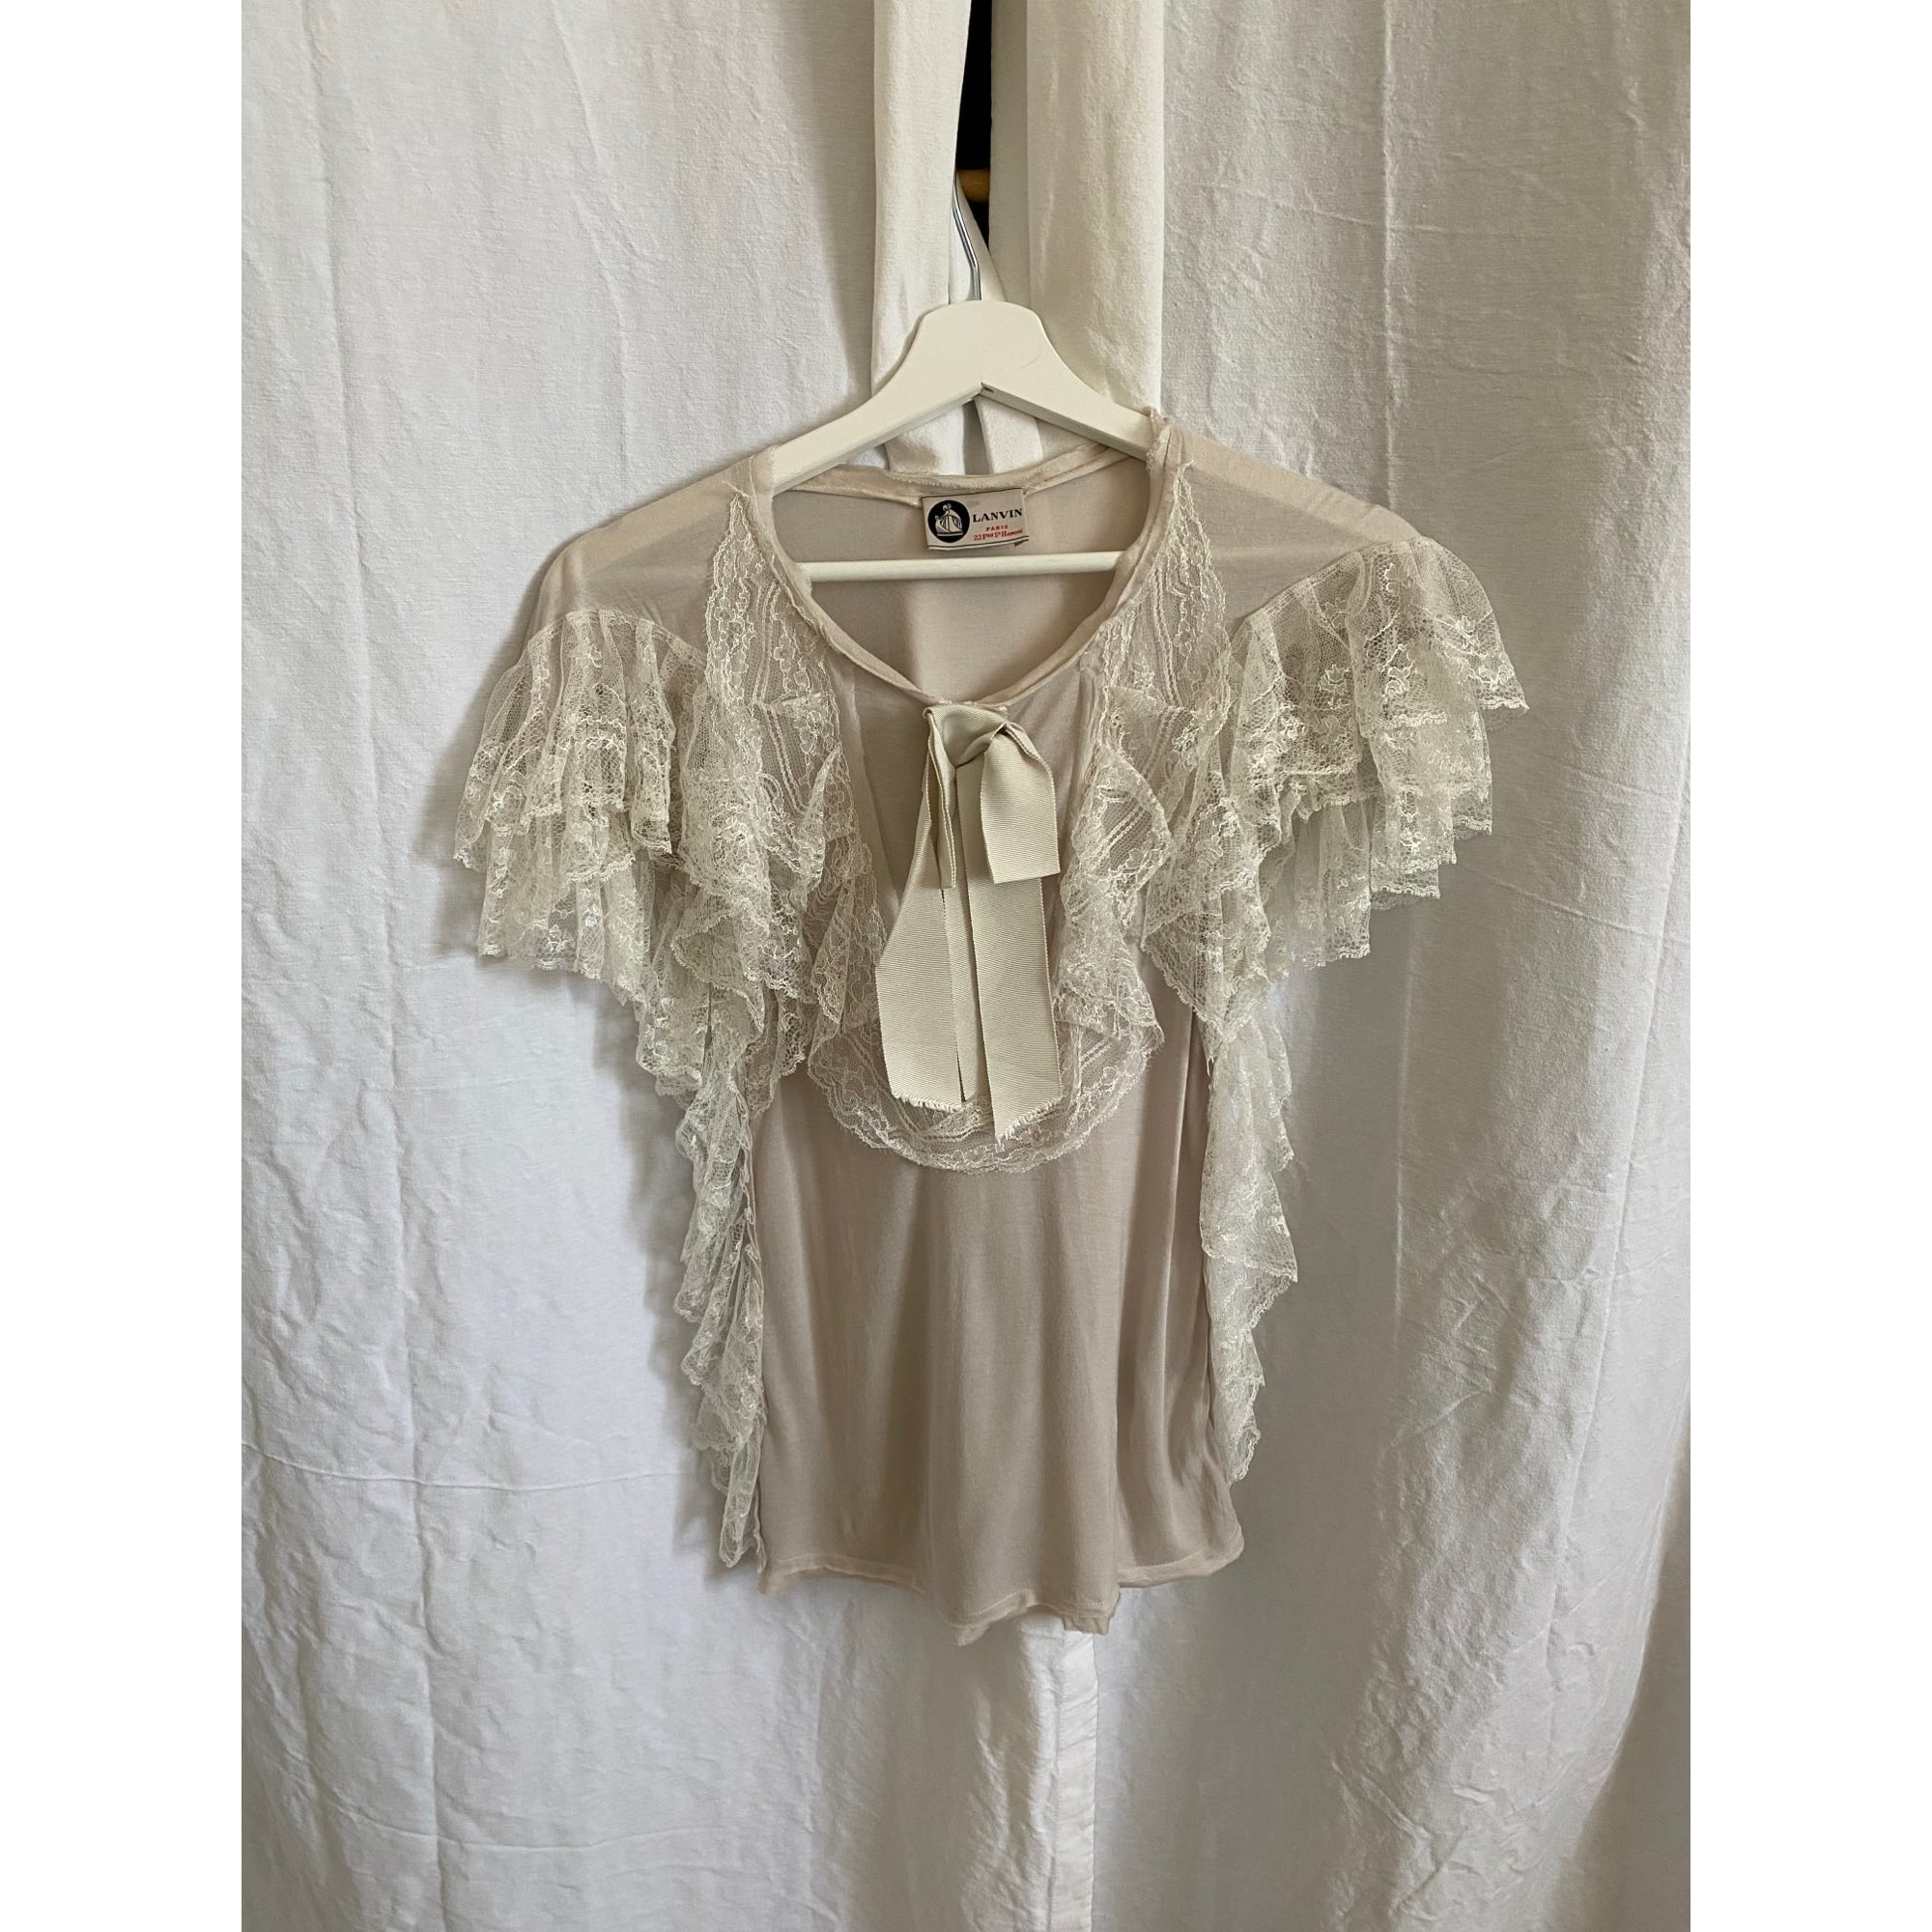 Top, tee-shirt LANVIN Blanc, blanc cassé, écru